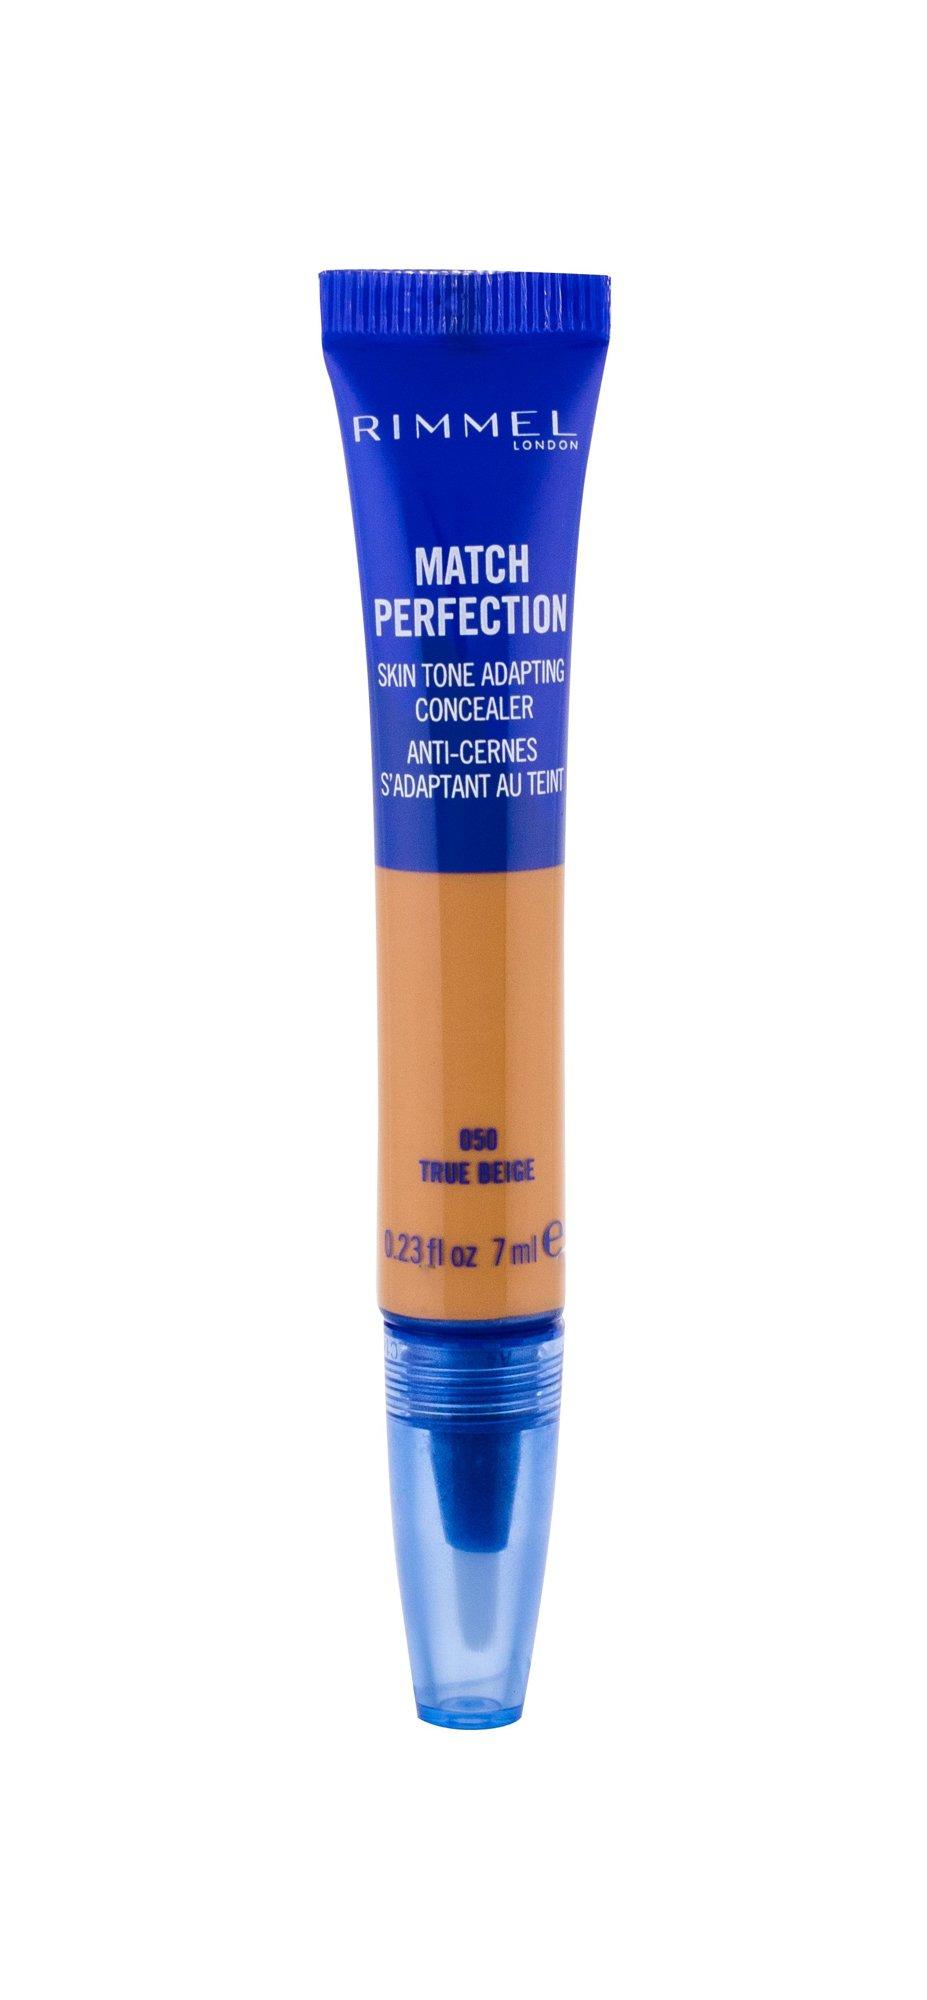 Rimmel London Match Perfection Corrector 7ml 050 True Beige